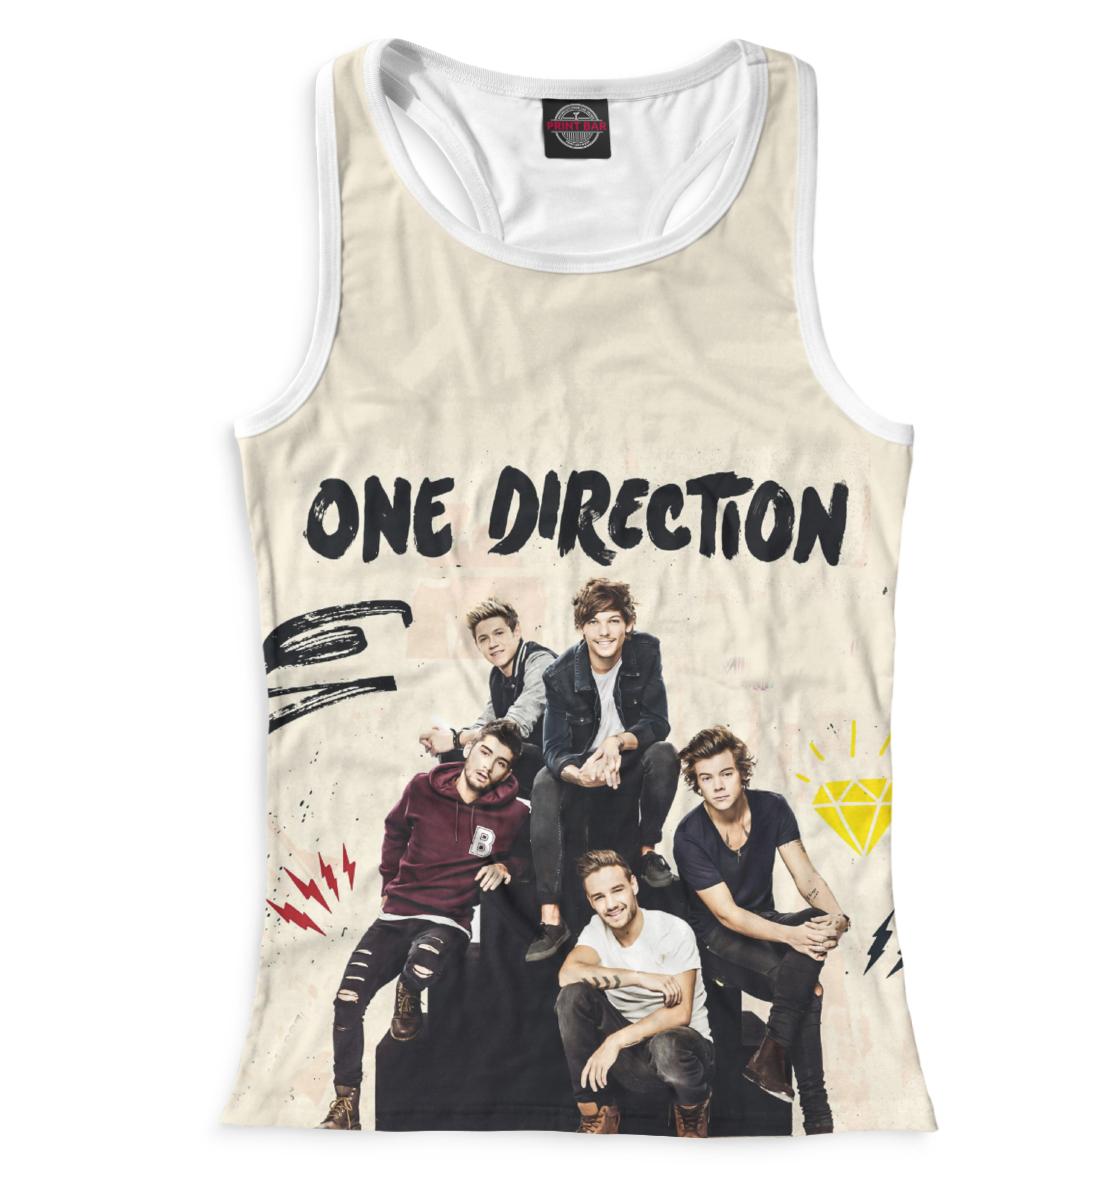 Купить One Direction, Printbar, Майки борцовки, OND-523272-mayb-1